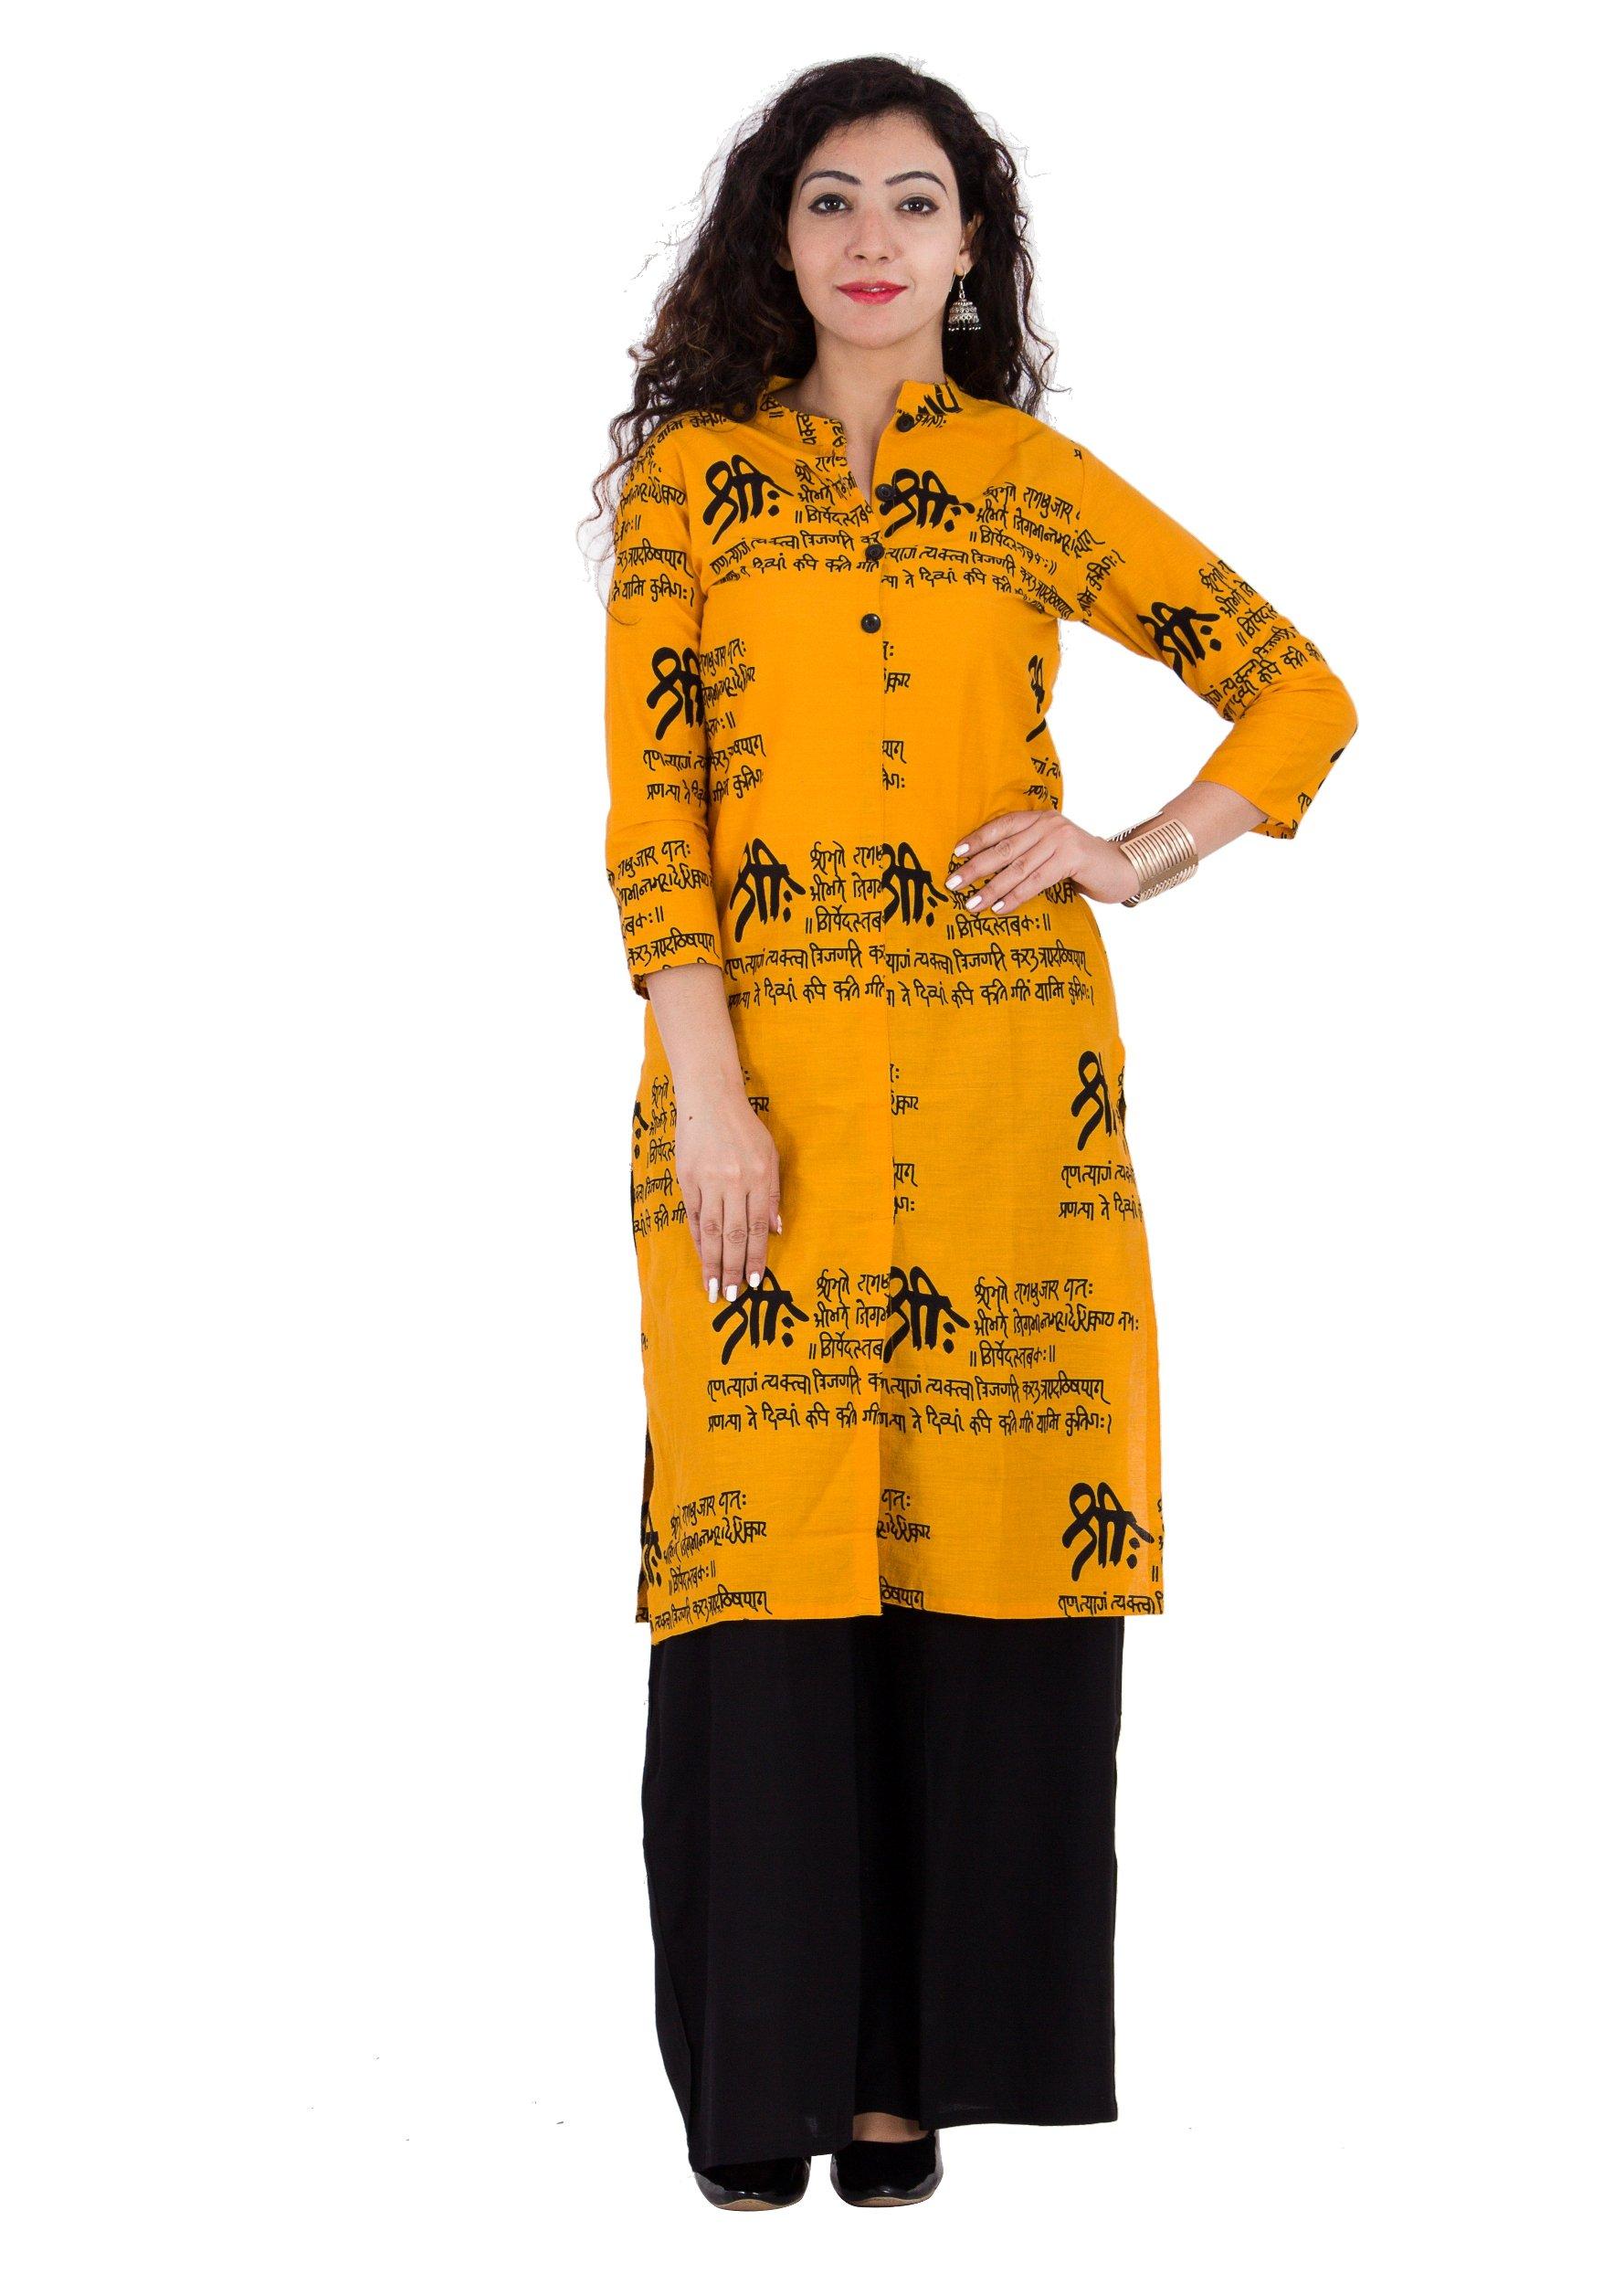 BrightJet Printed Yellow Wooden Button Cotton Women Fashion FrontSlit Kurti Straight fit Kurta Top Tunic Party Dress (XL)